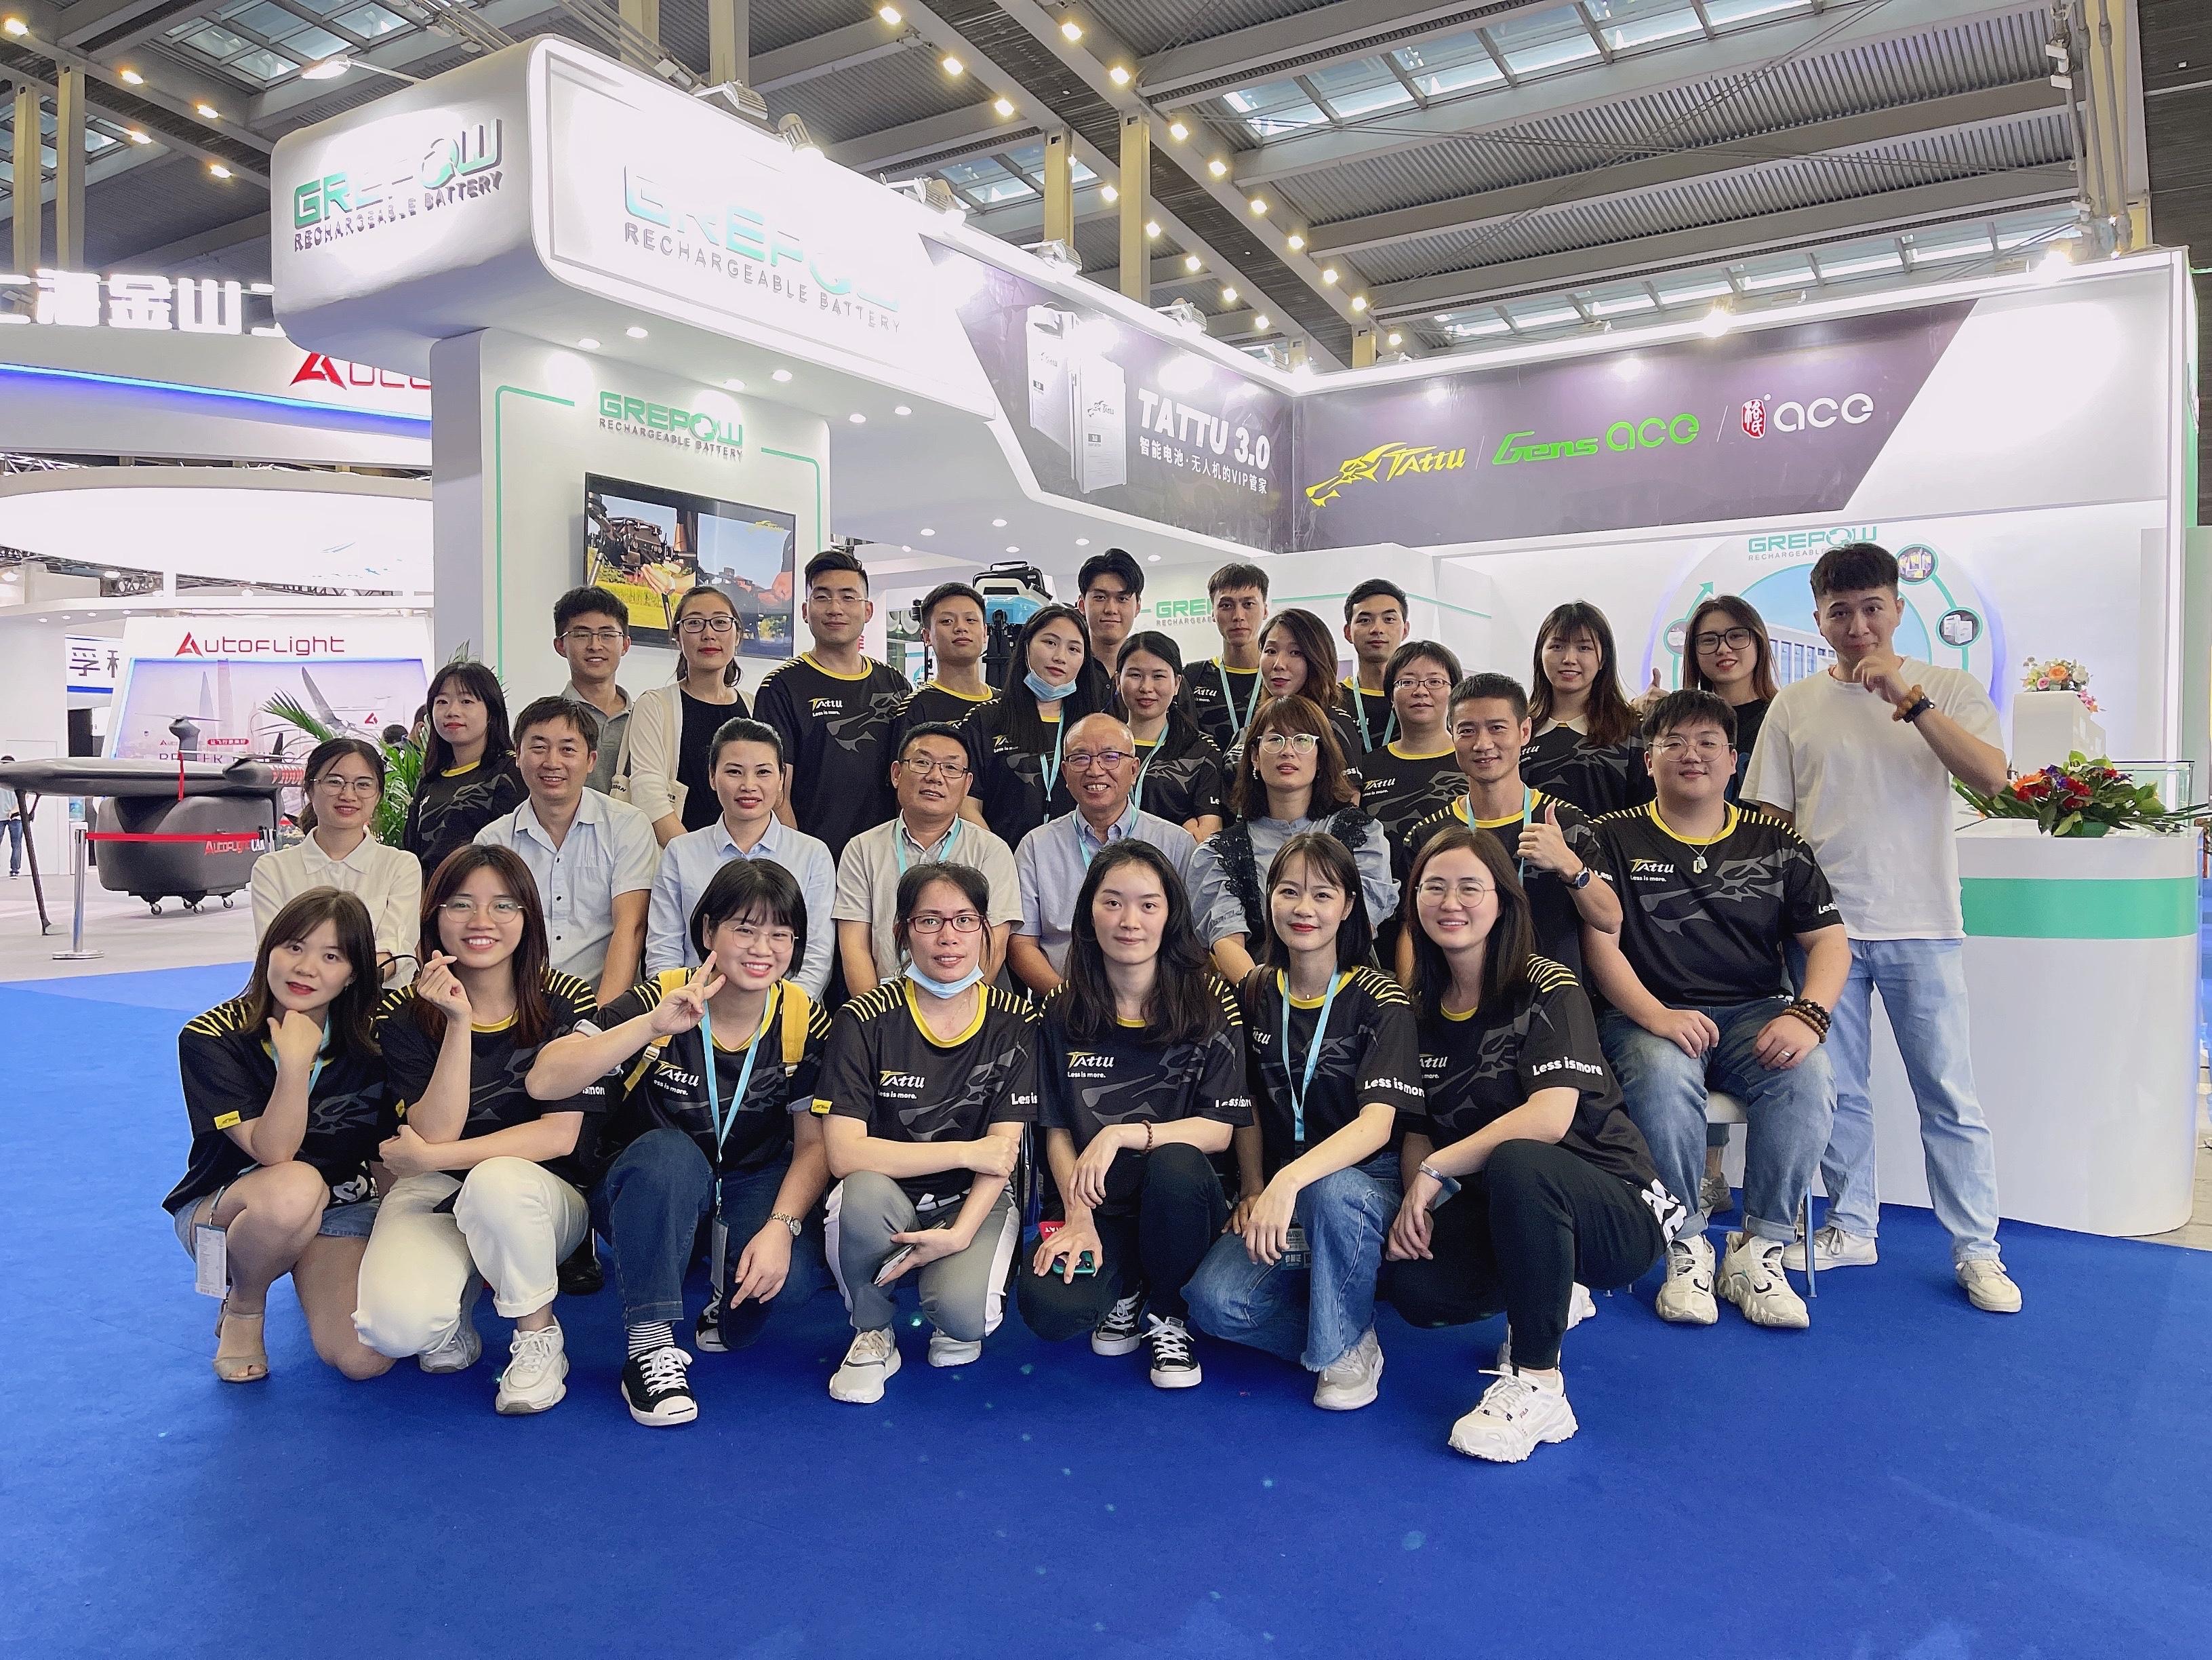 Grepow Tattu Team done the drone world expo